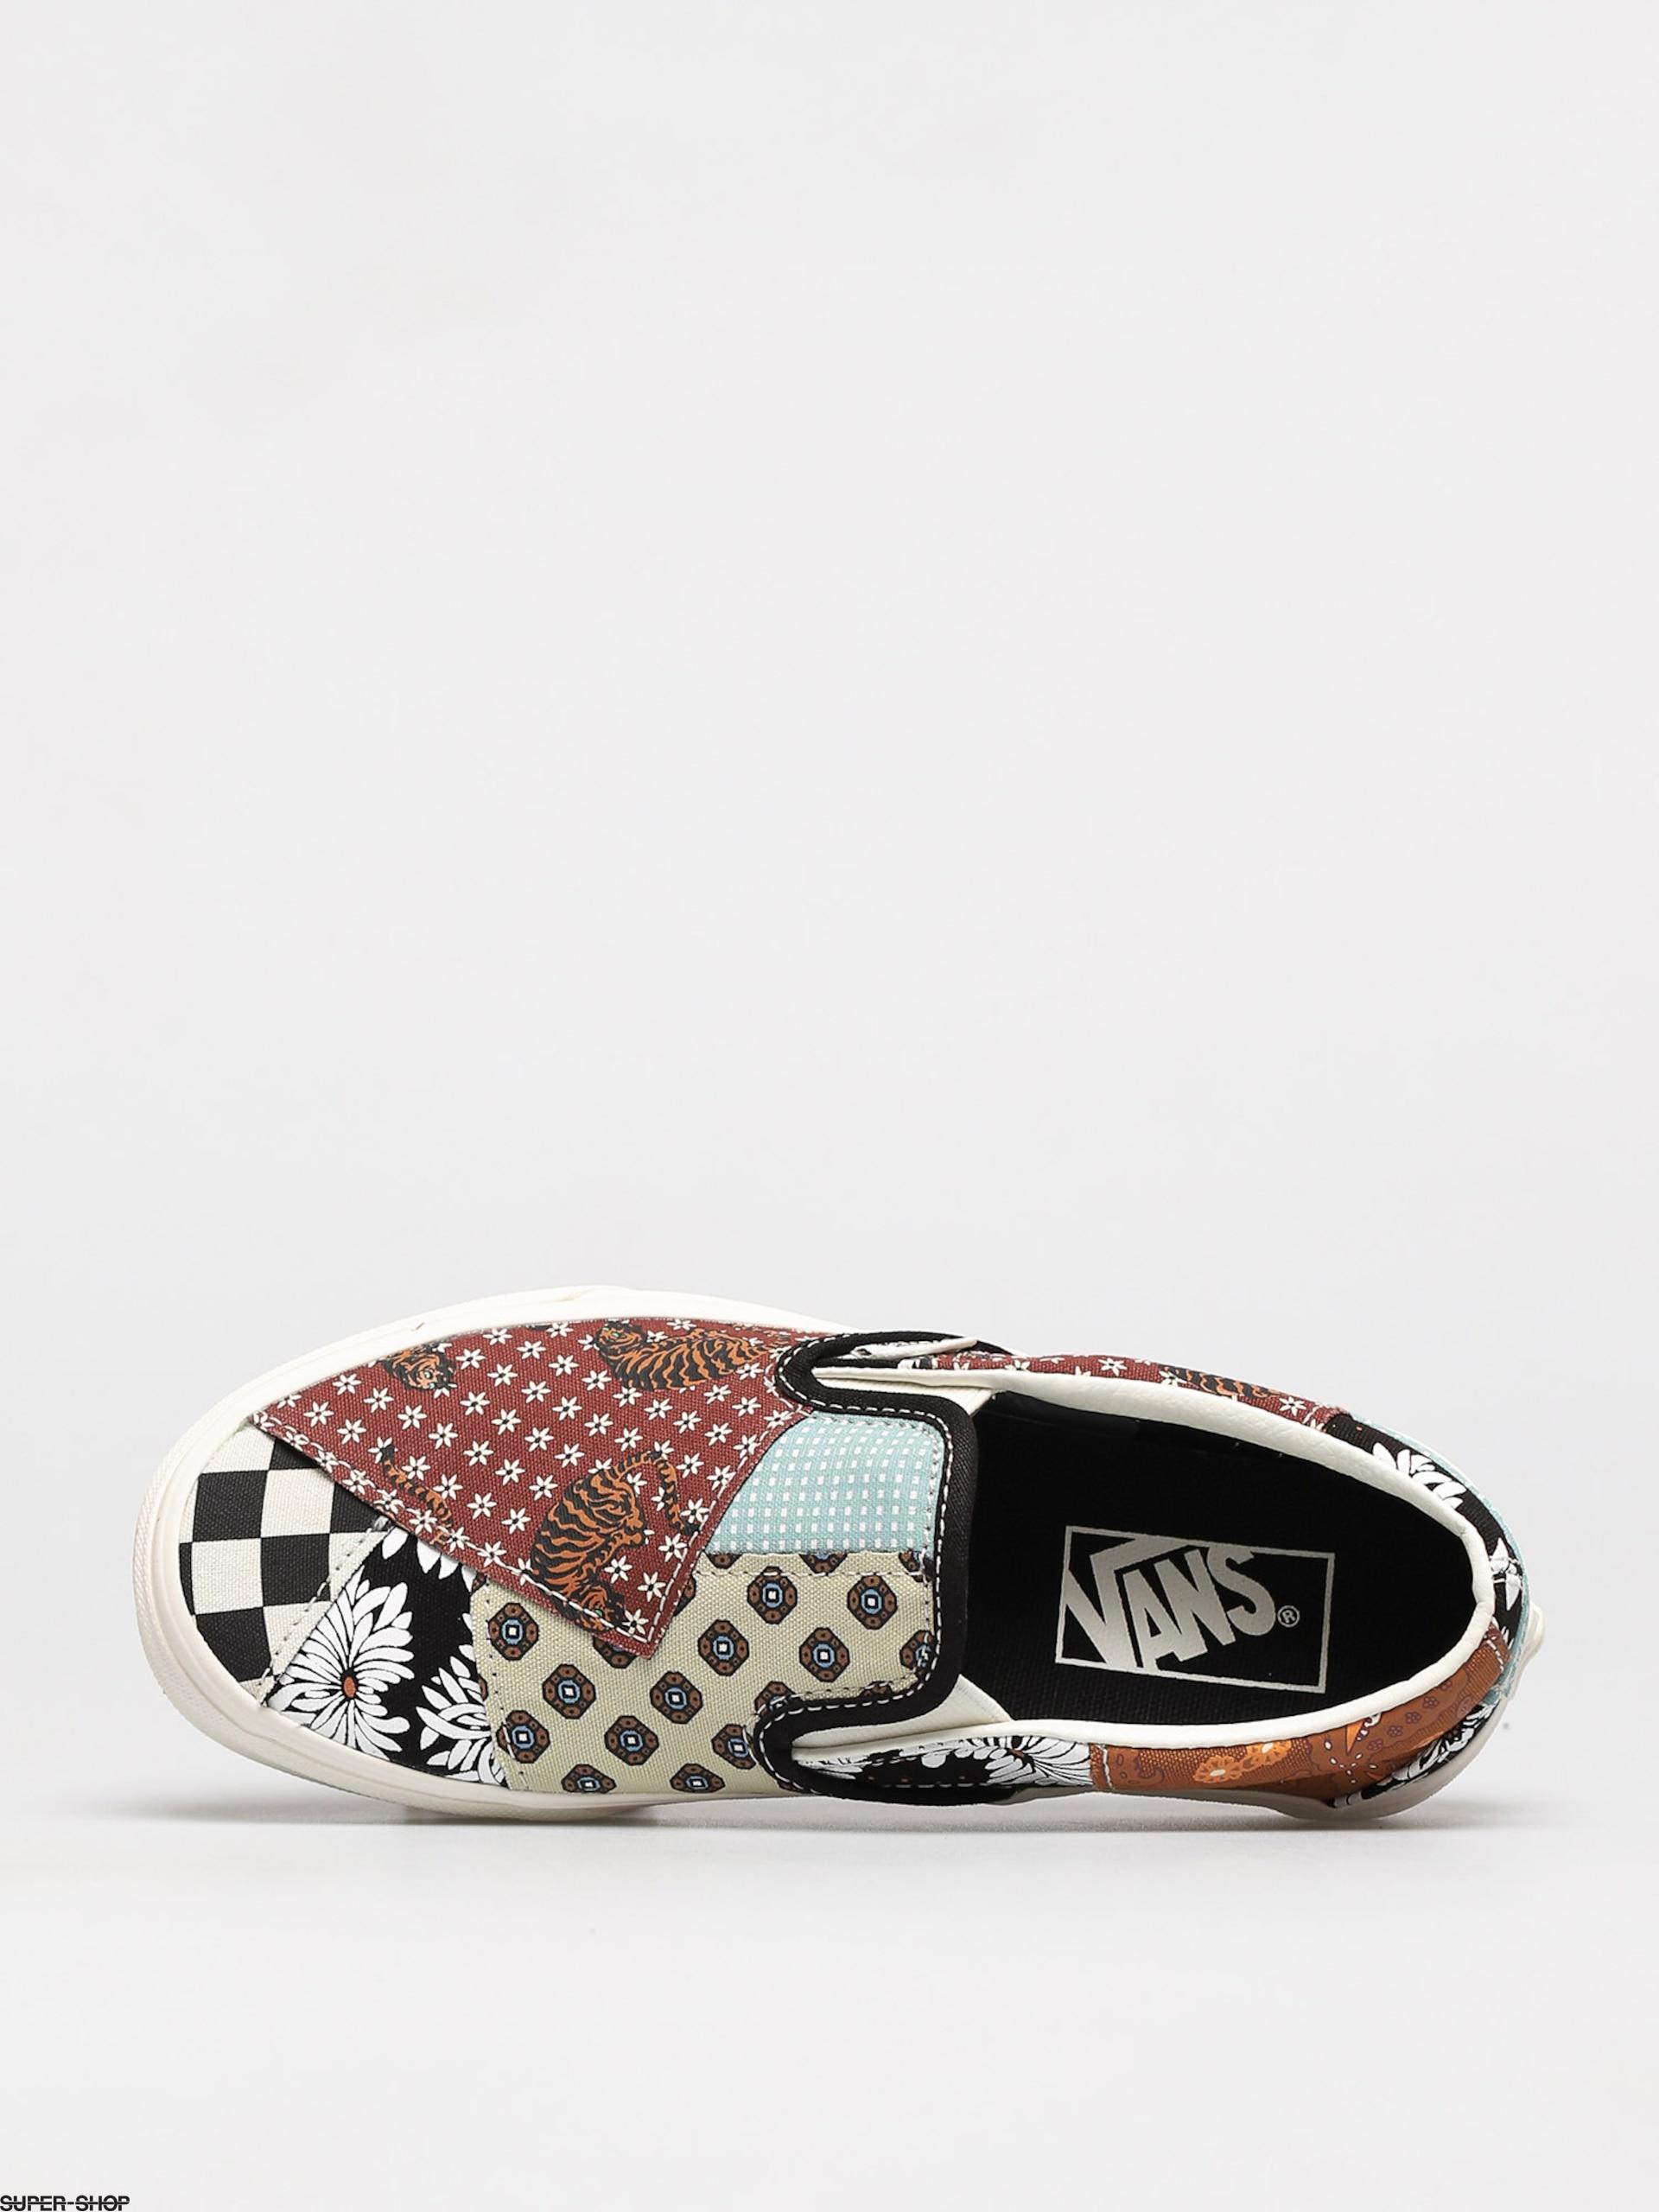 Vans Classic Slip On Shoes Tiger Patchwork Blktrwht